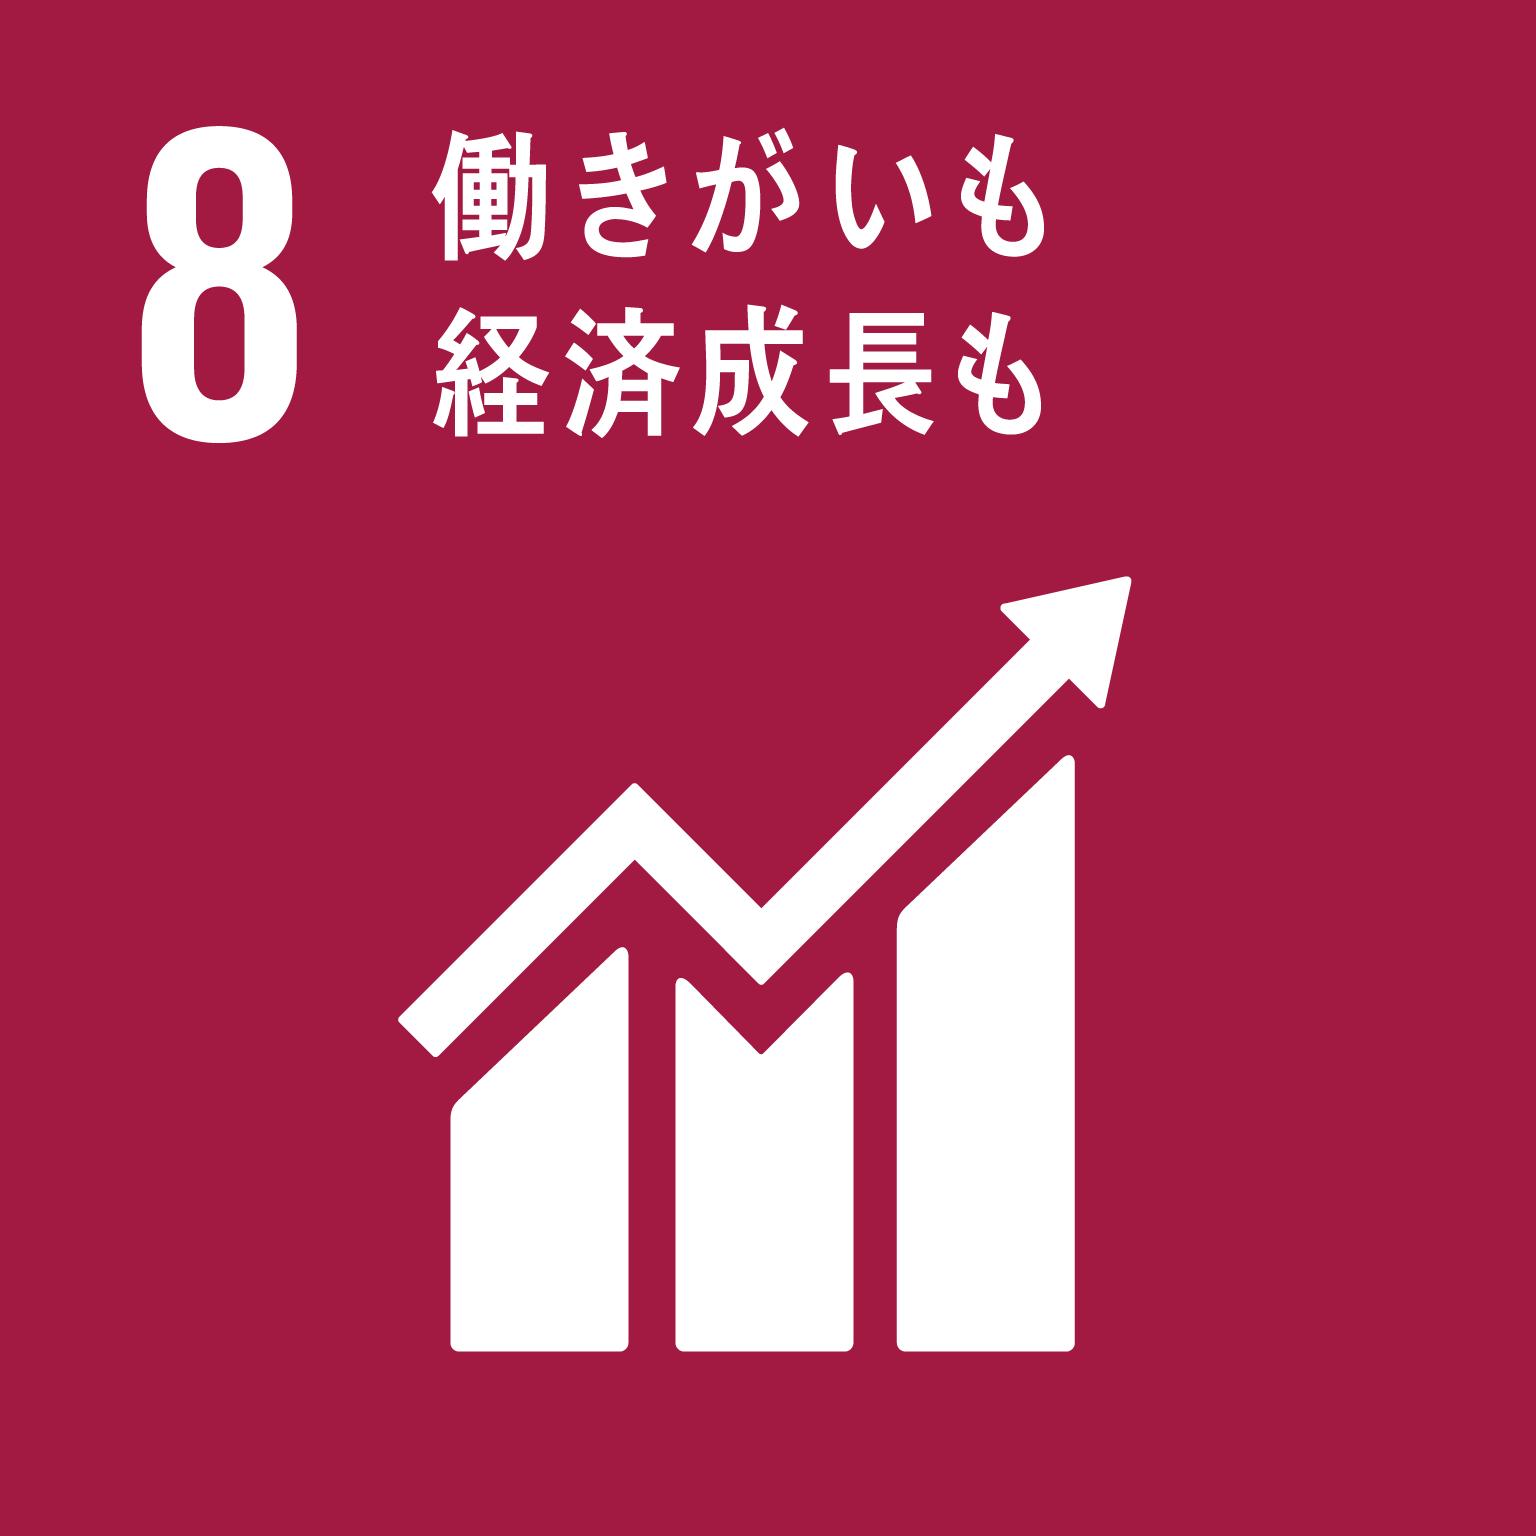 SDGs 働きがいも経済成長も